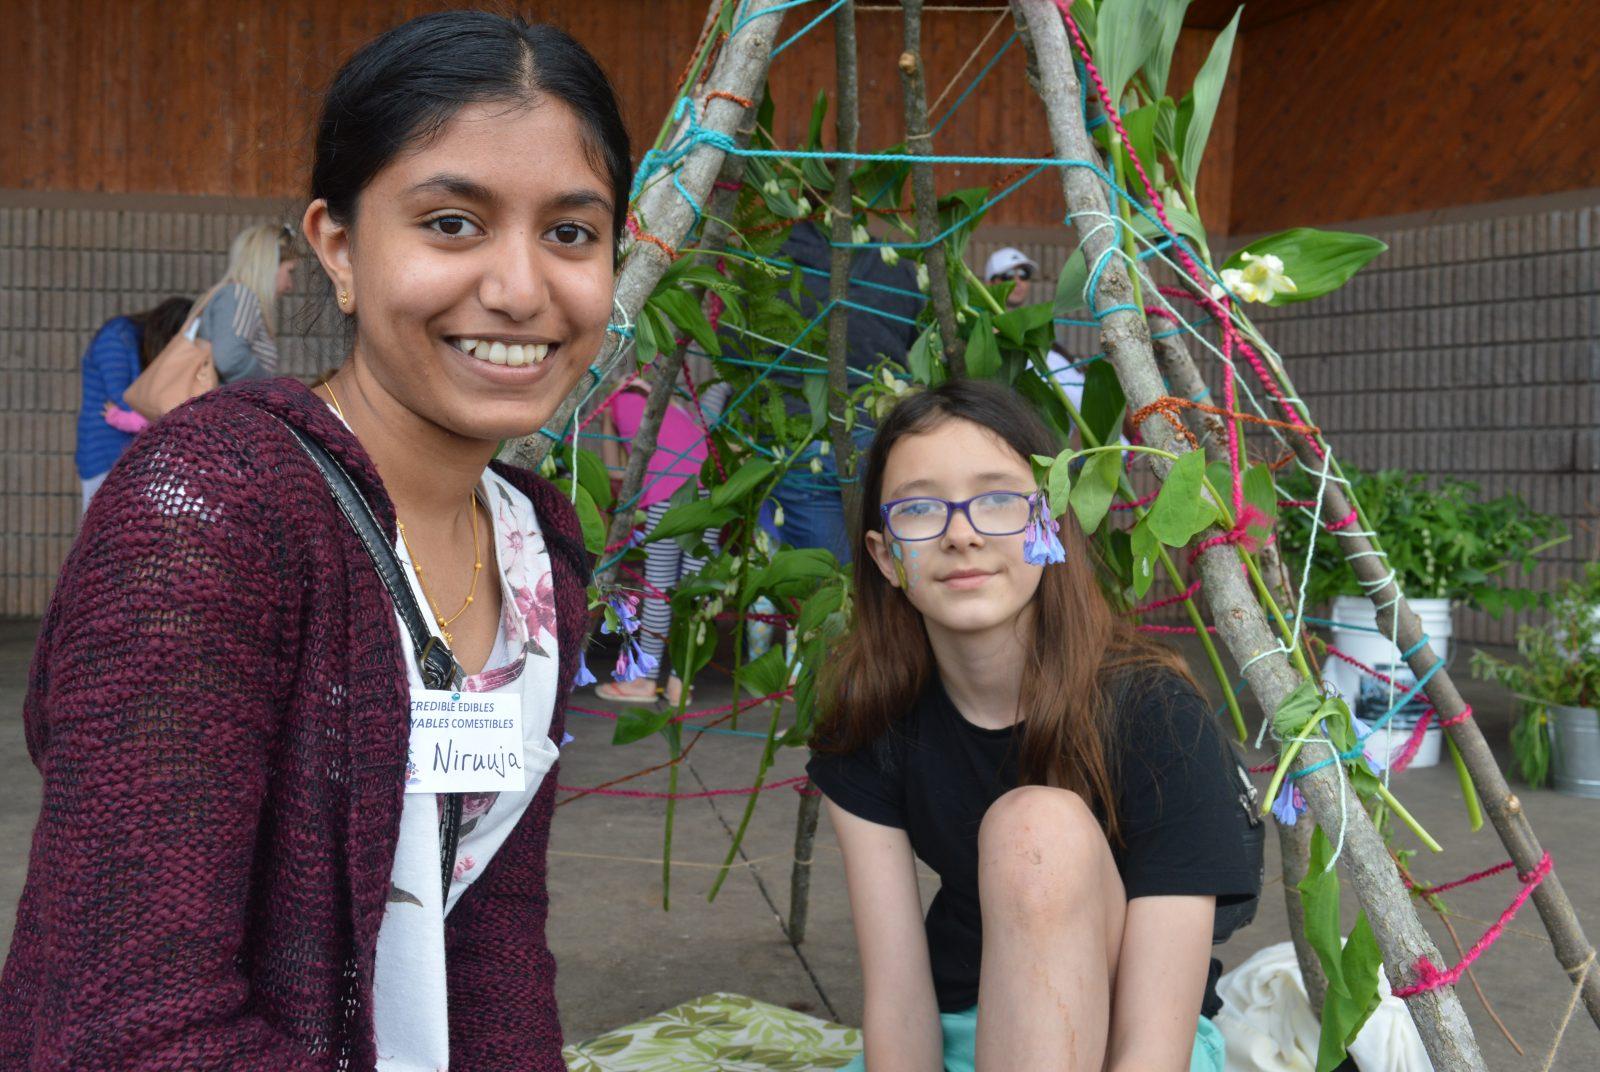 Plant Festival focuses on sustainability